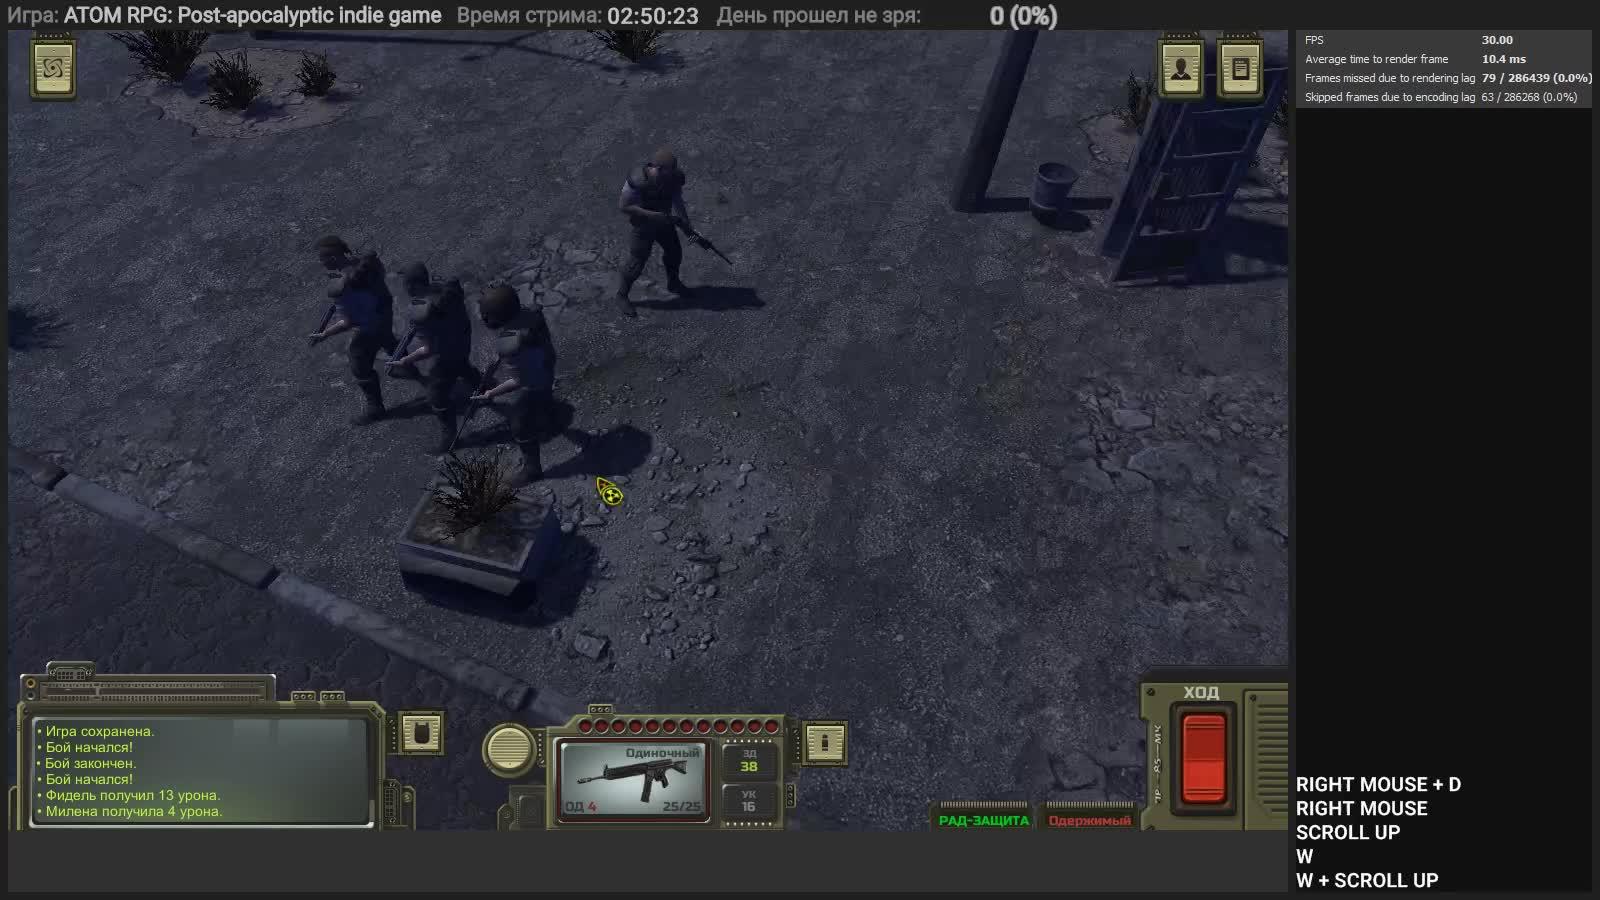 Usernm - [RUS][18+] Импортозамещение фаллаута - Twitch